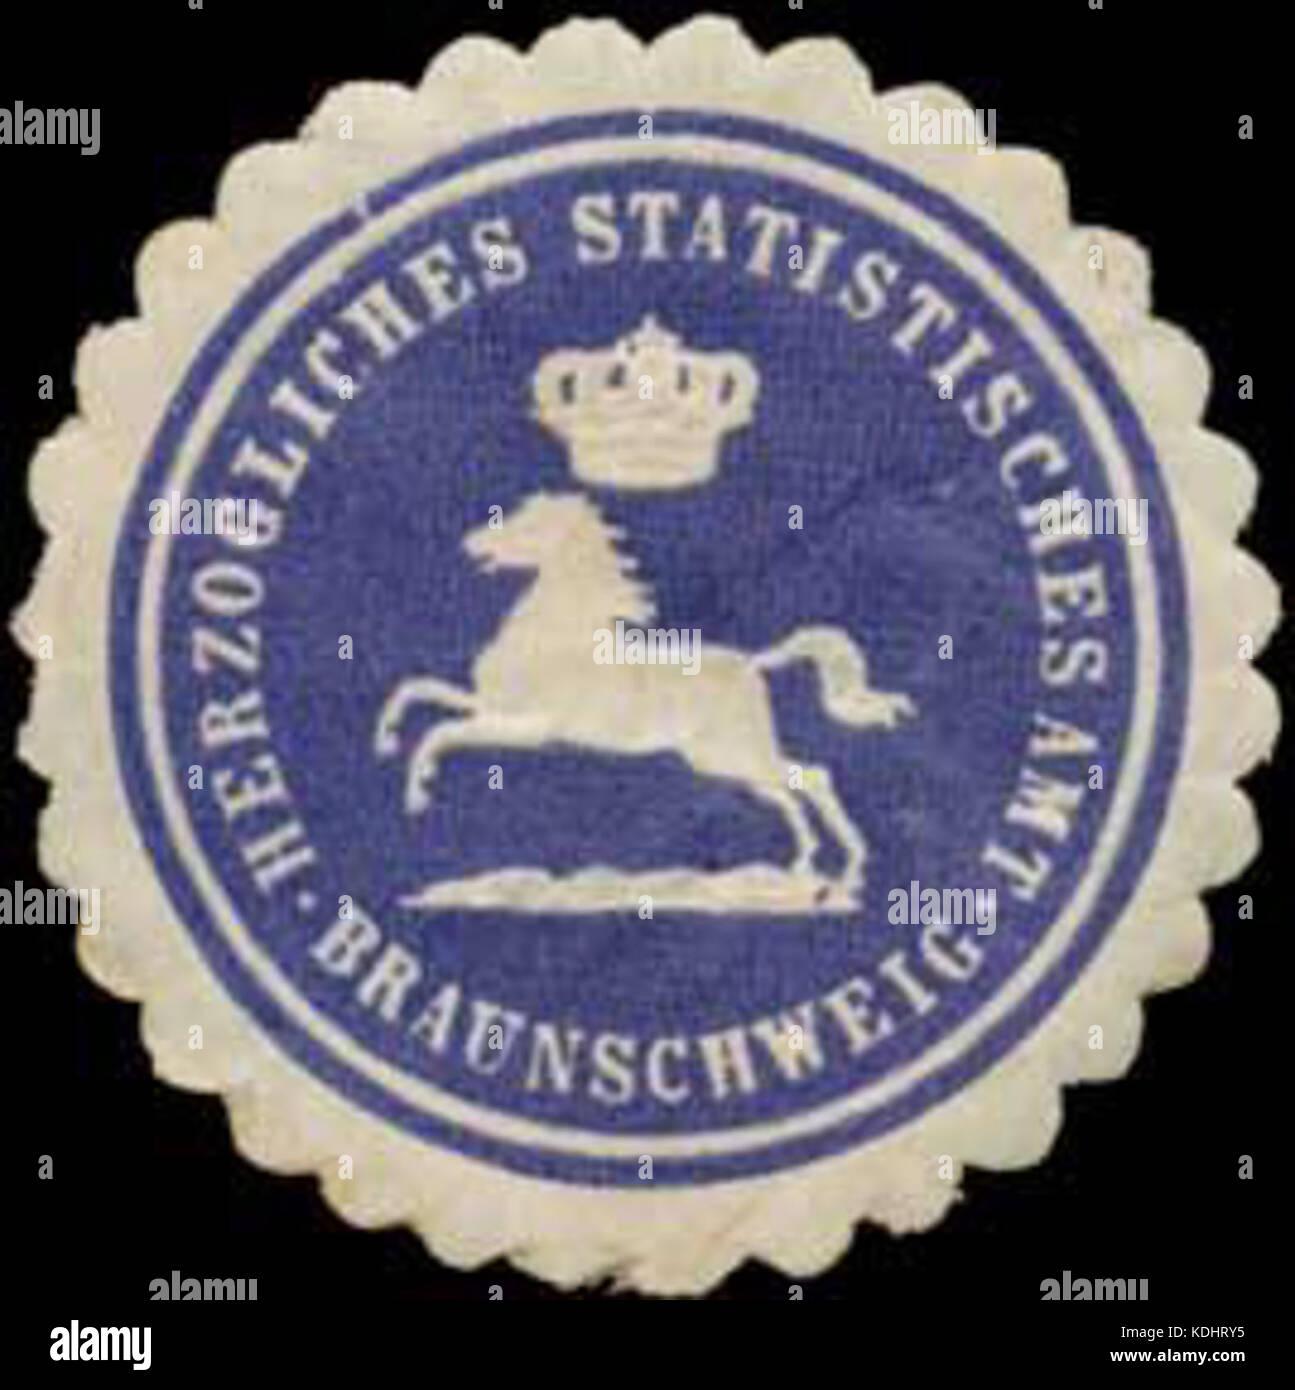 Schön Idealer Drahtcaddy Fotos - Schaltplan Serie Circuit Collection ...